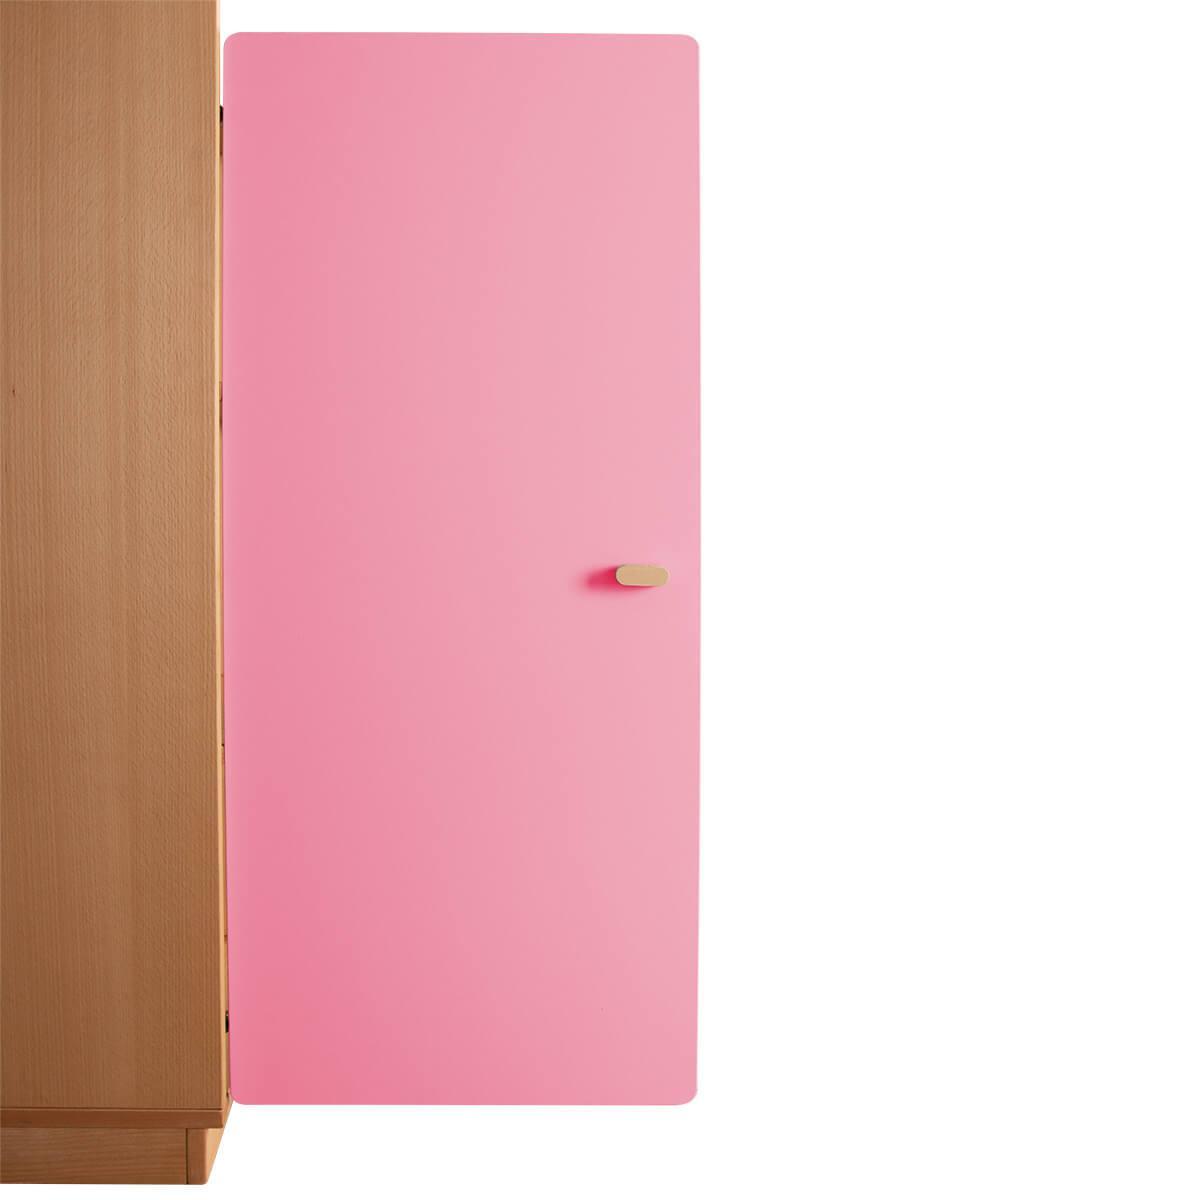 Schranktür 3/5 106cm-Griff DESTYLE de Breuyn MDF rosa-lackiert